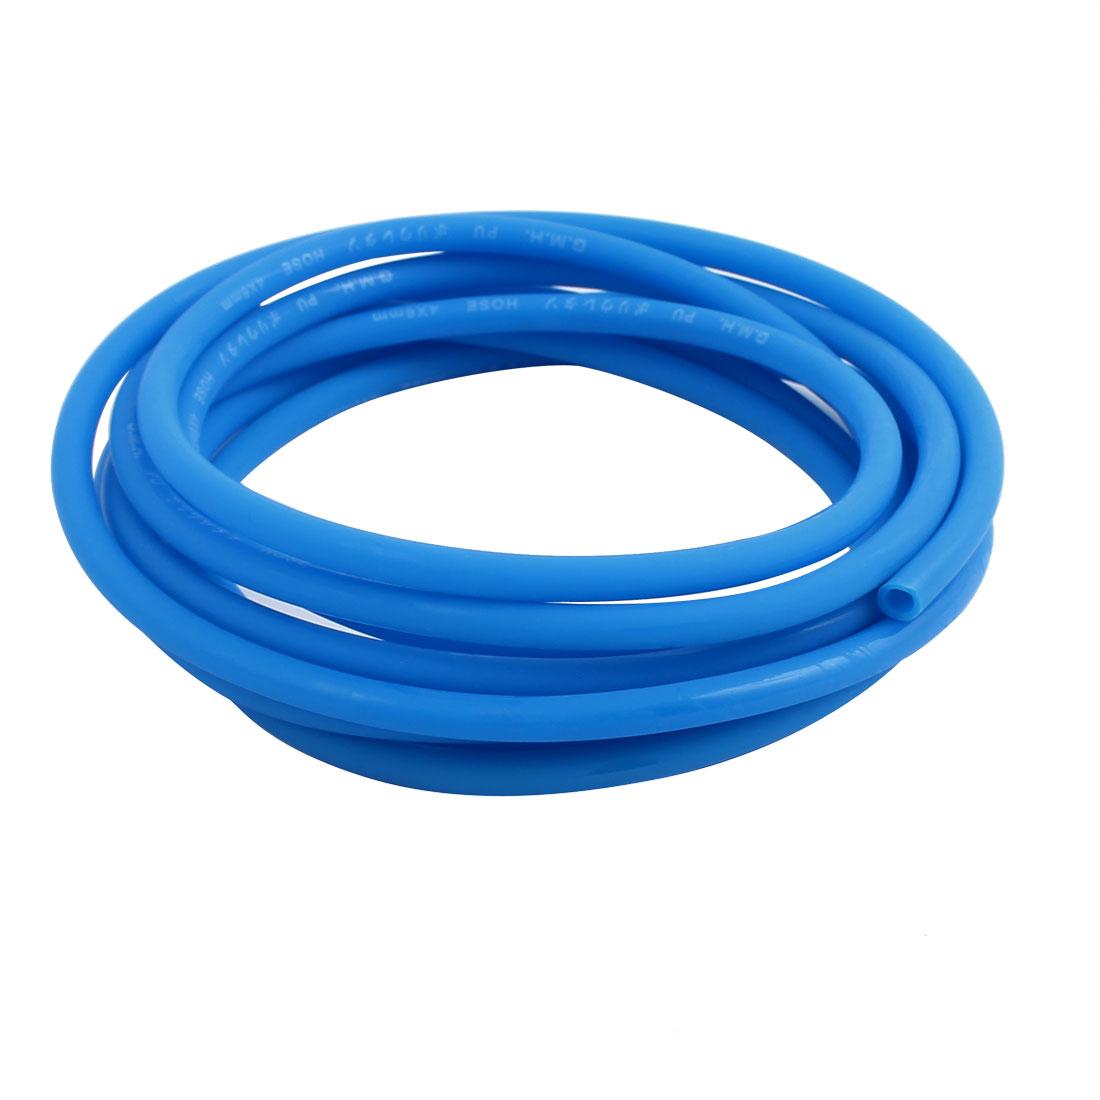 4mm x 6mm Flexible Pneumatic Polyurethane PU Hose Pipe Tube Blue 2.8m Length